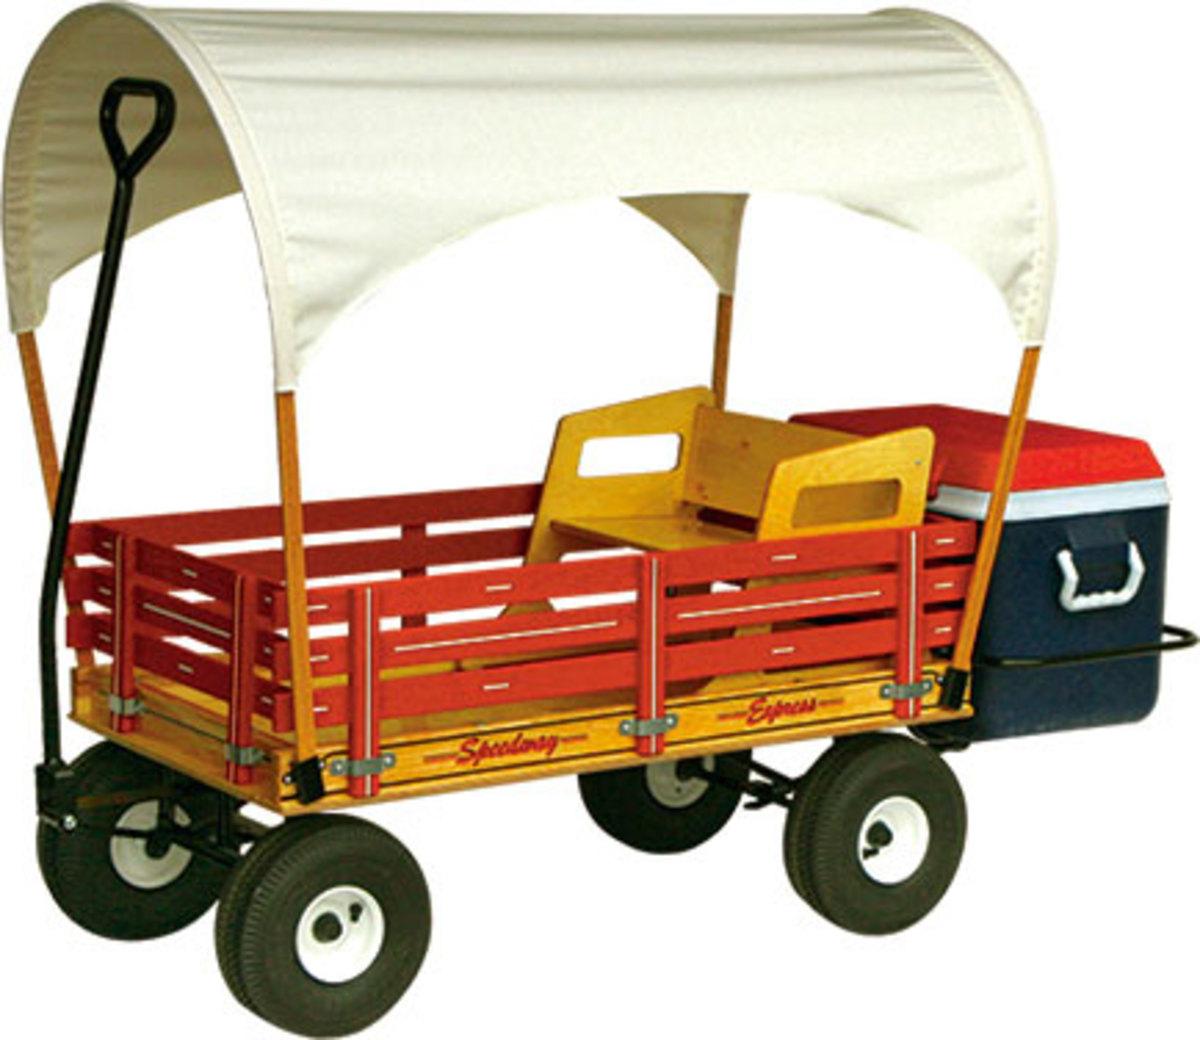 Kids coaster style wagons